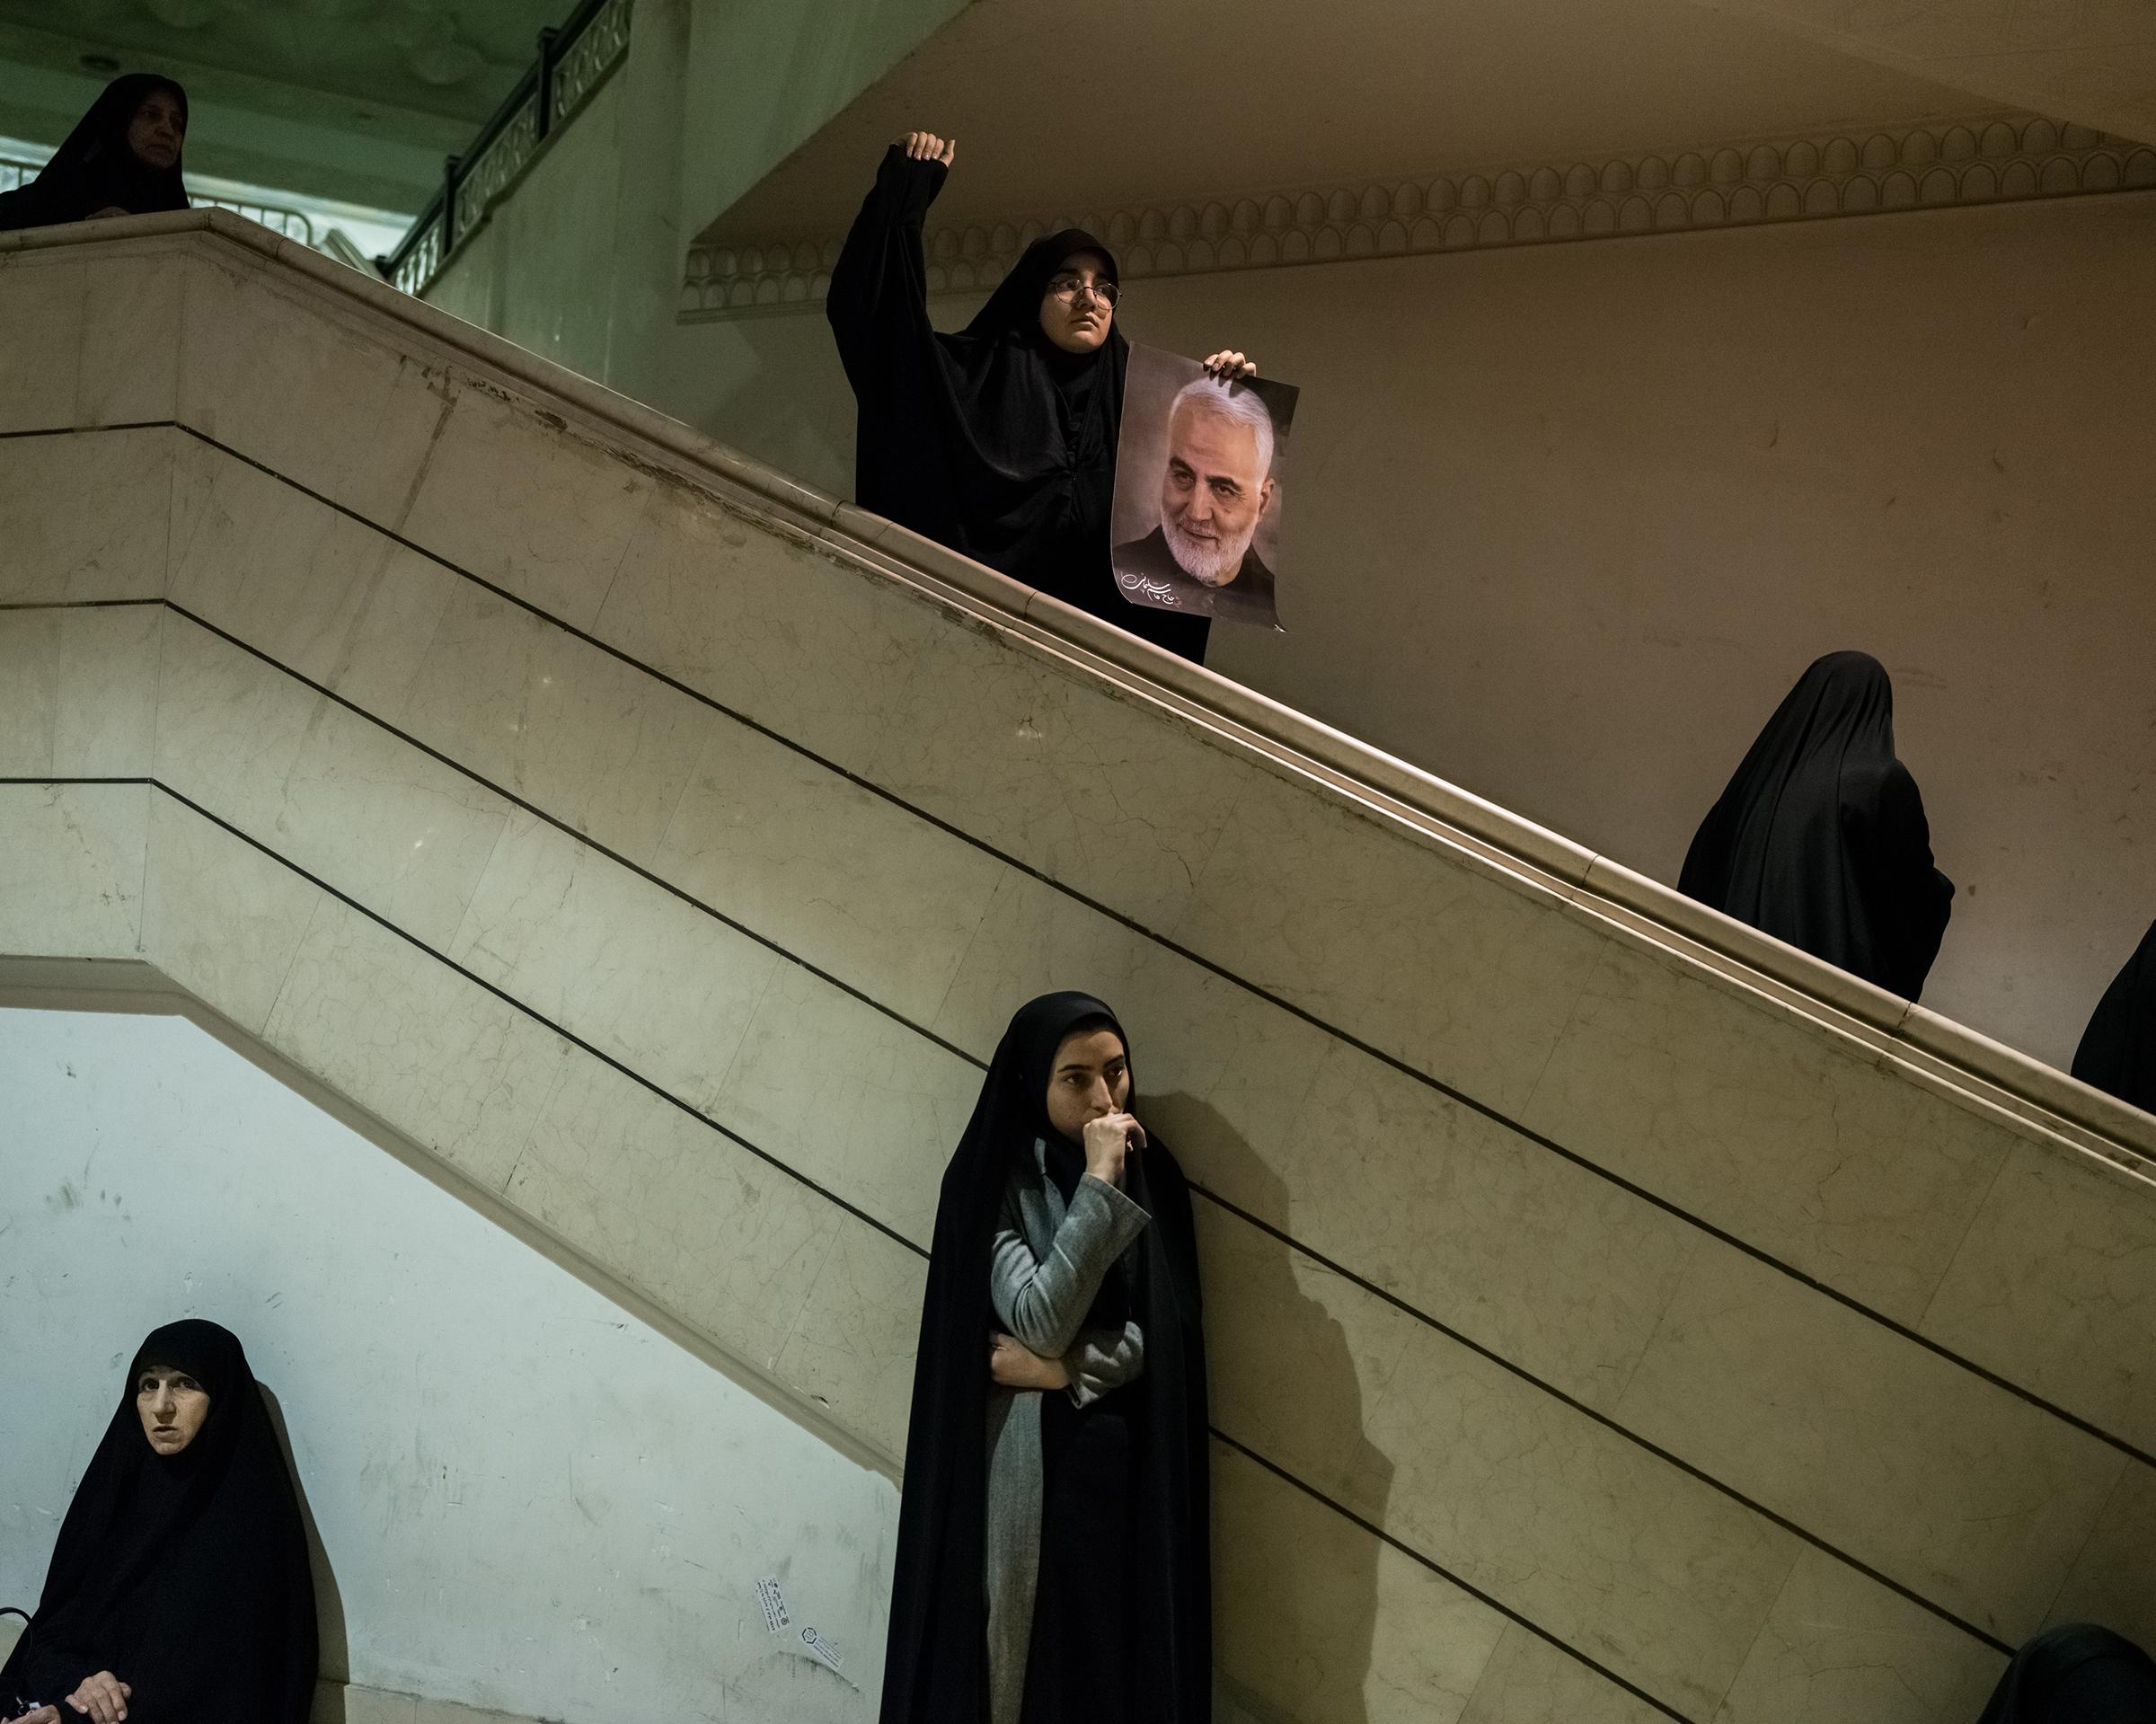 Iranian women at a mosque in Tehran, on Jan. 5, mourn Qasem Soleimani's death.